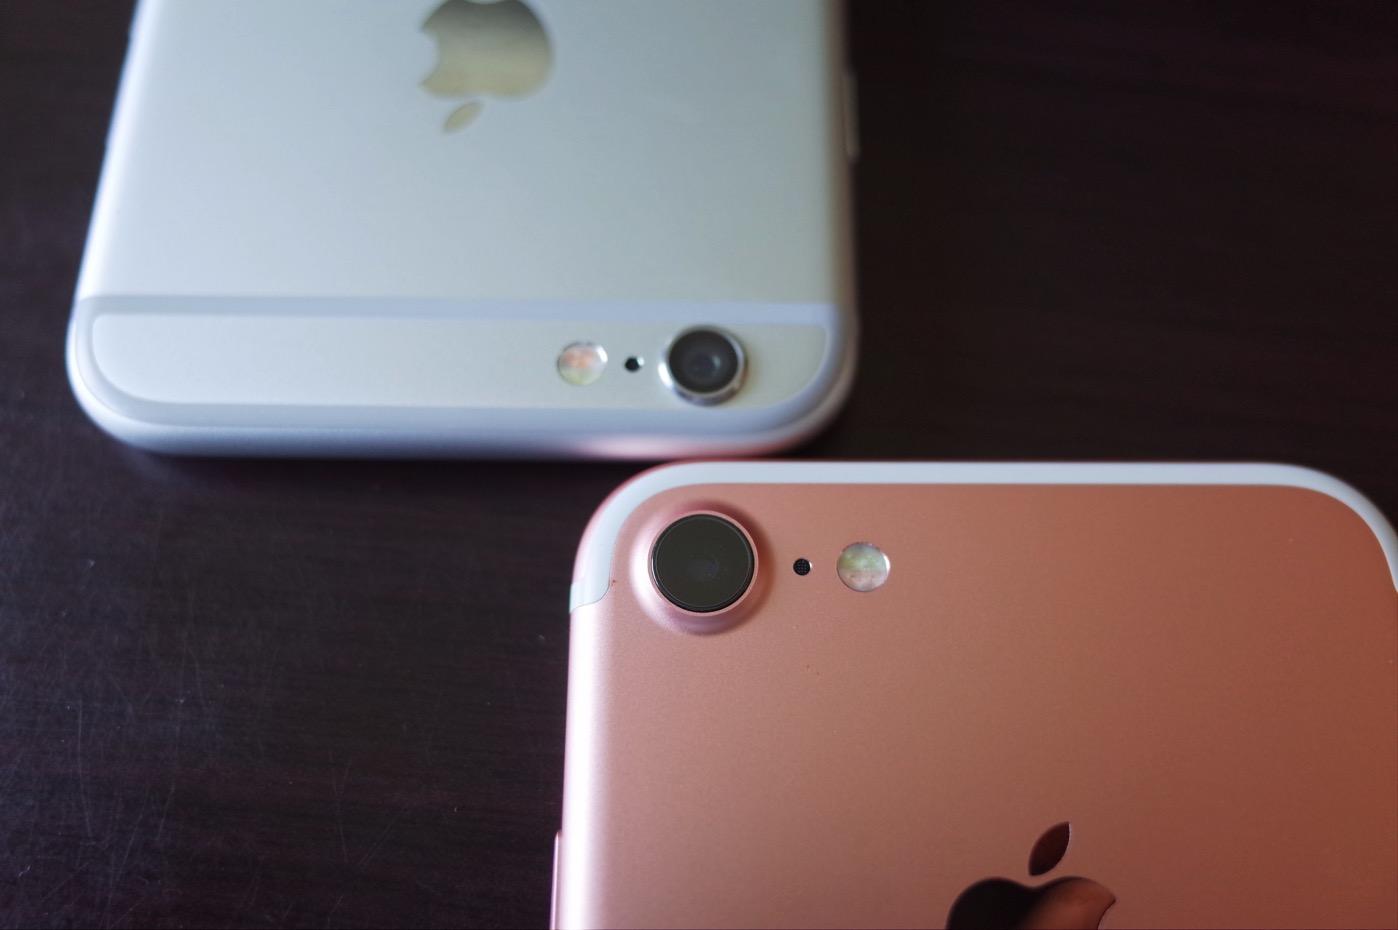 [iPhone]新型iPhone 7と愛用のiPhone 6を比べてみたよ